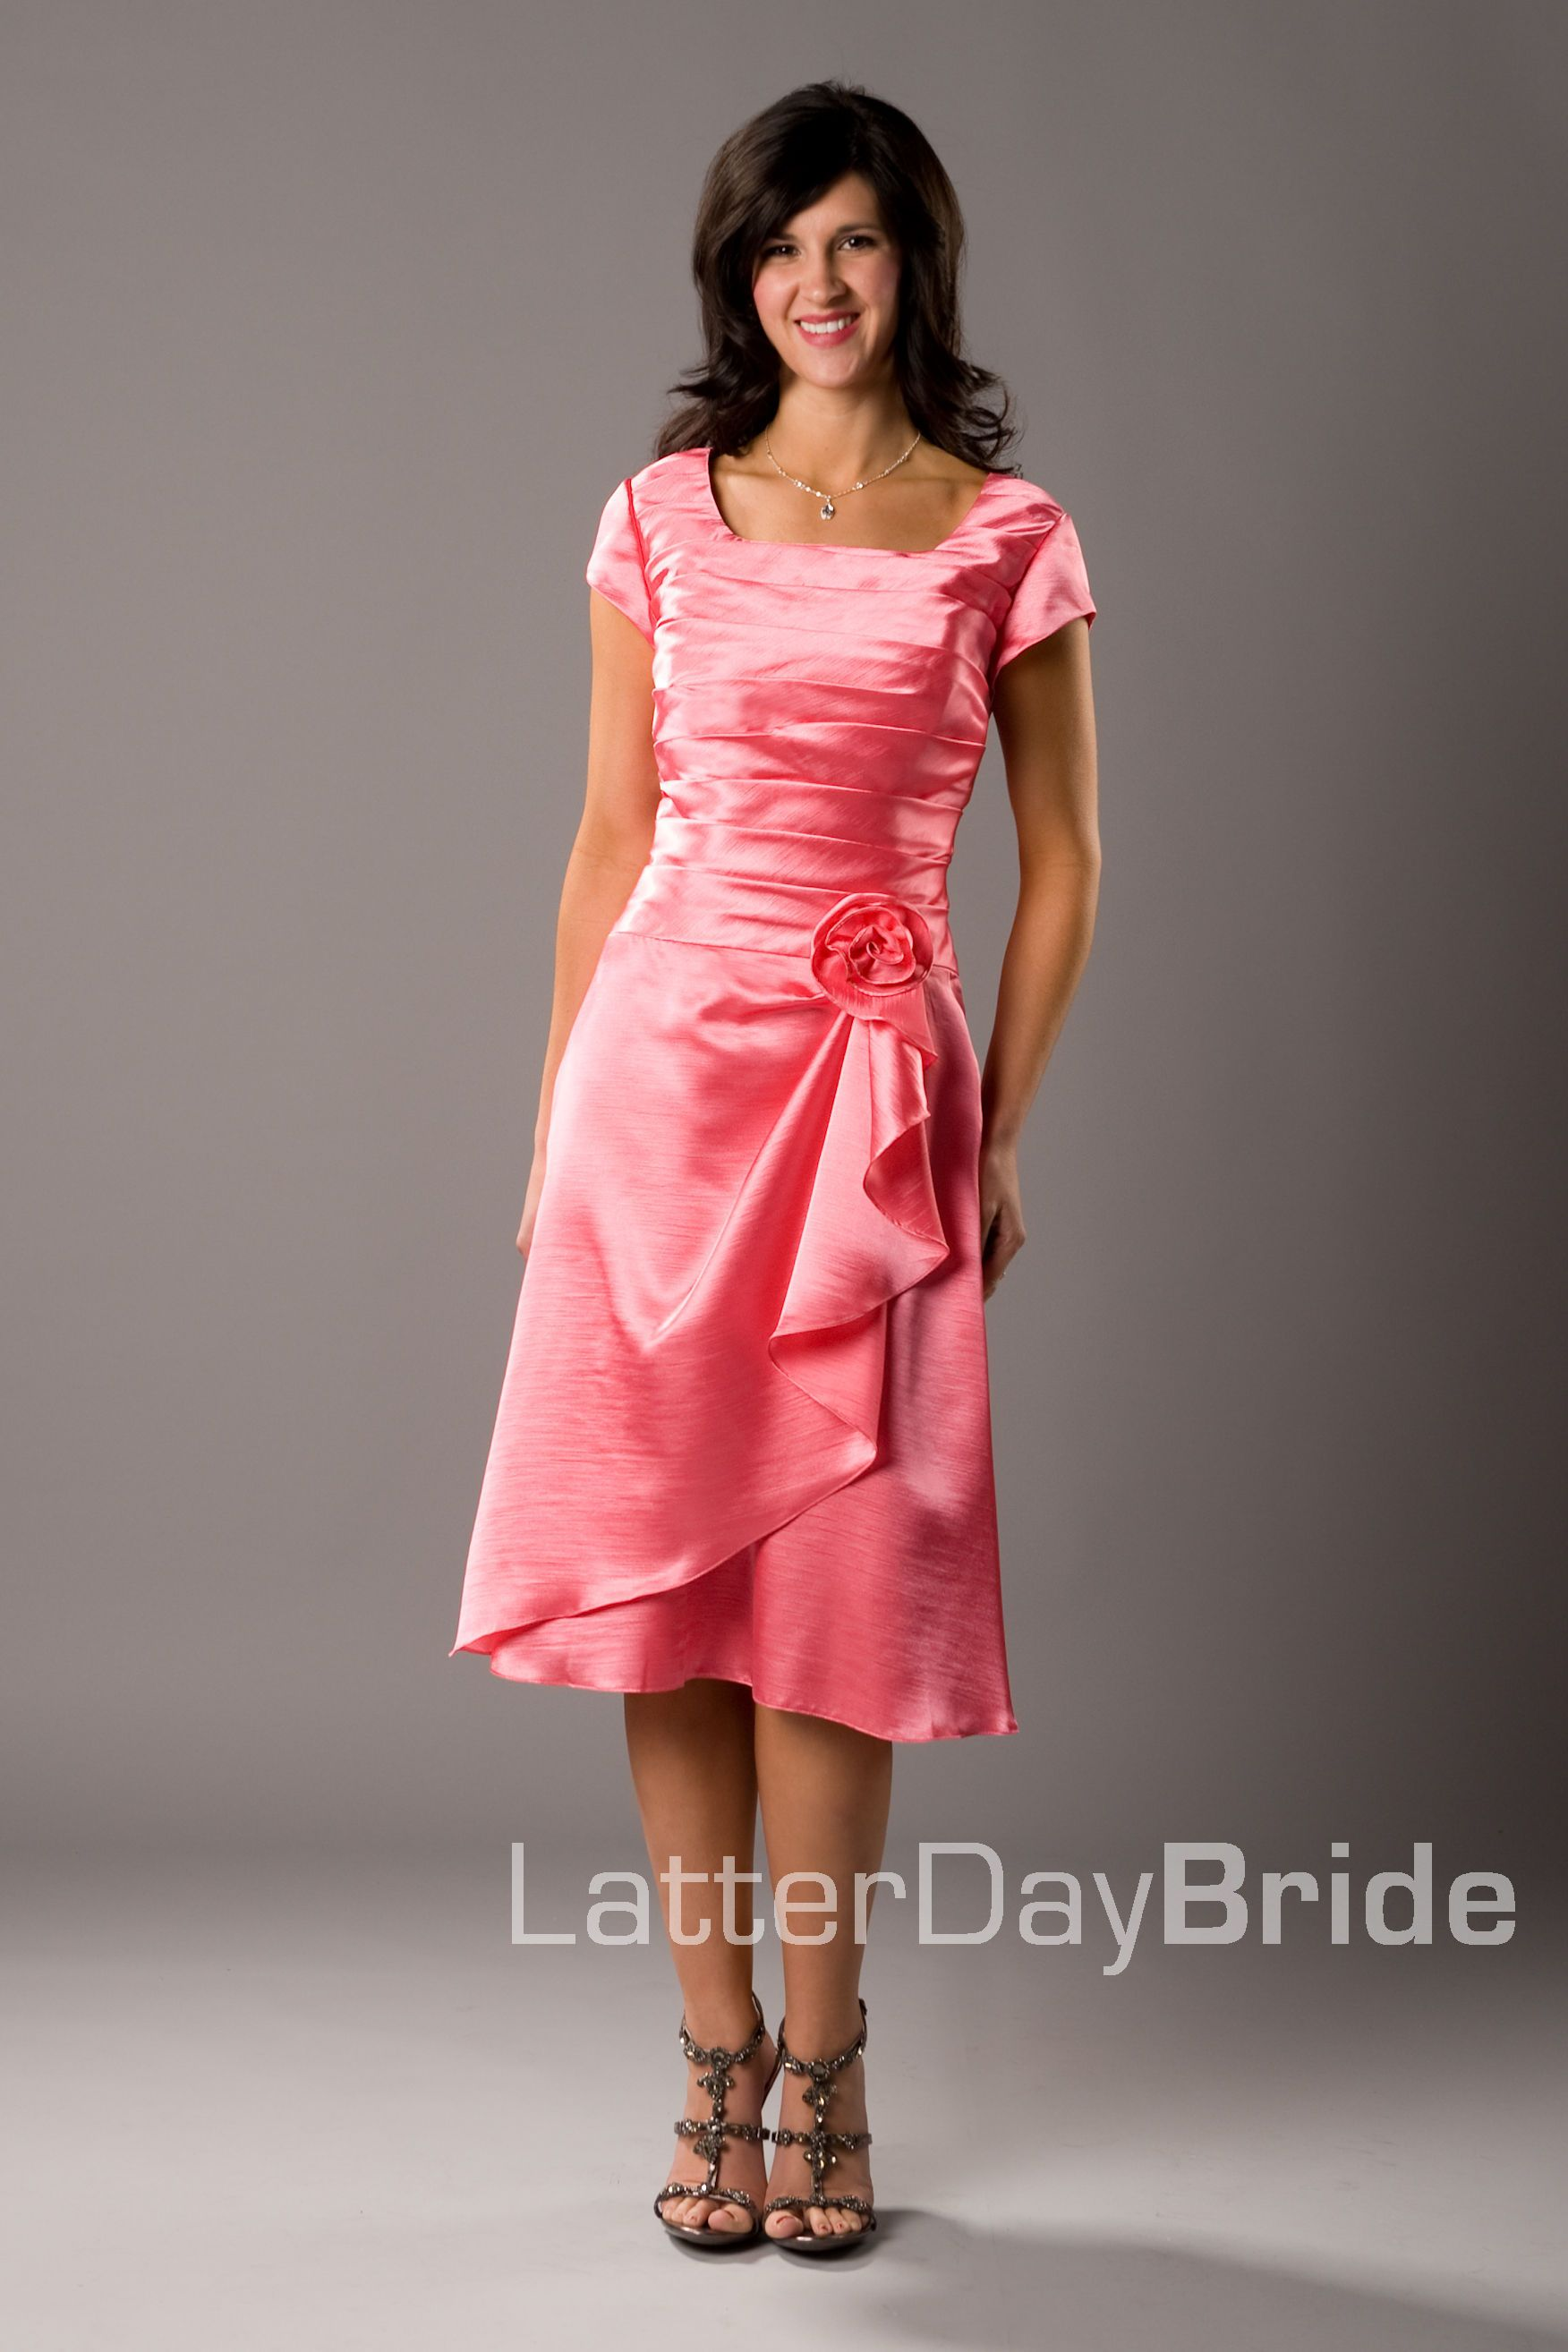 Bridesmaid & Prom, Alisha | LatterDayBride & Prom Modest Mormon LDS ...